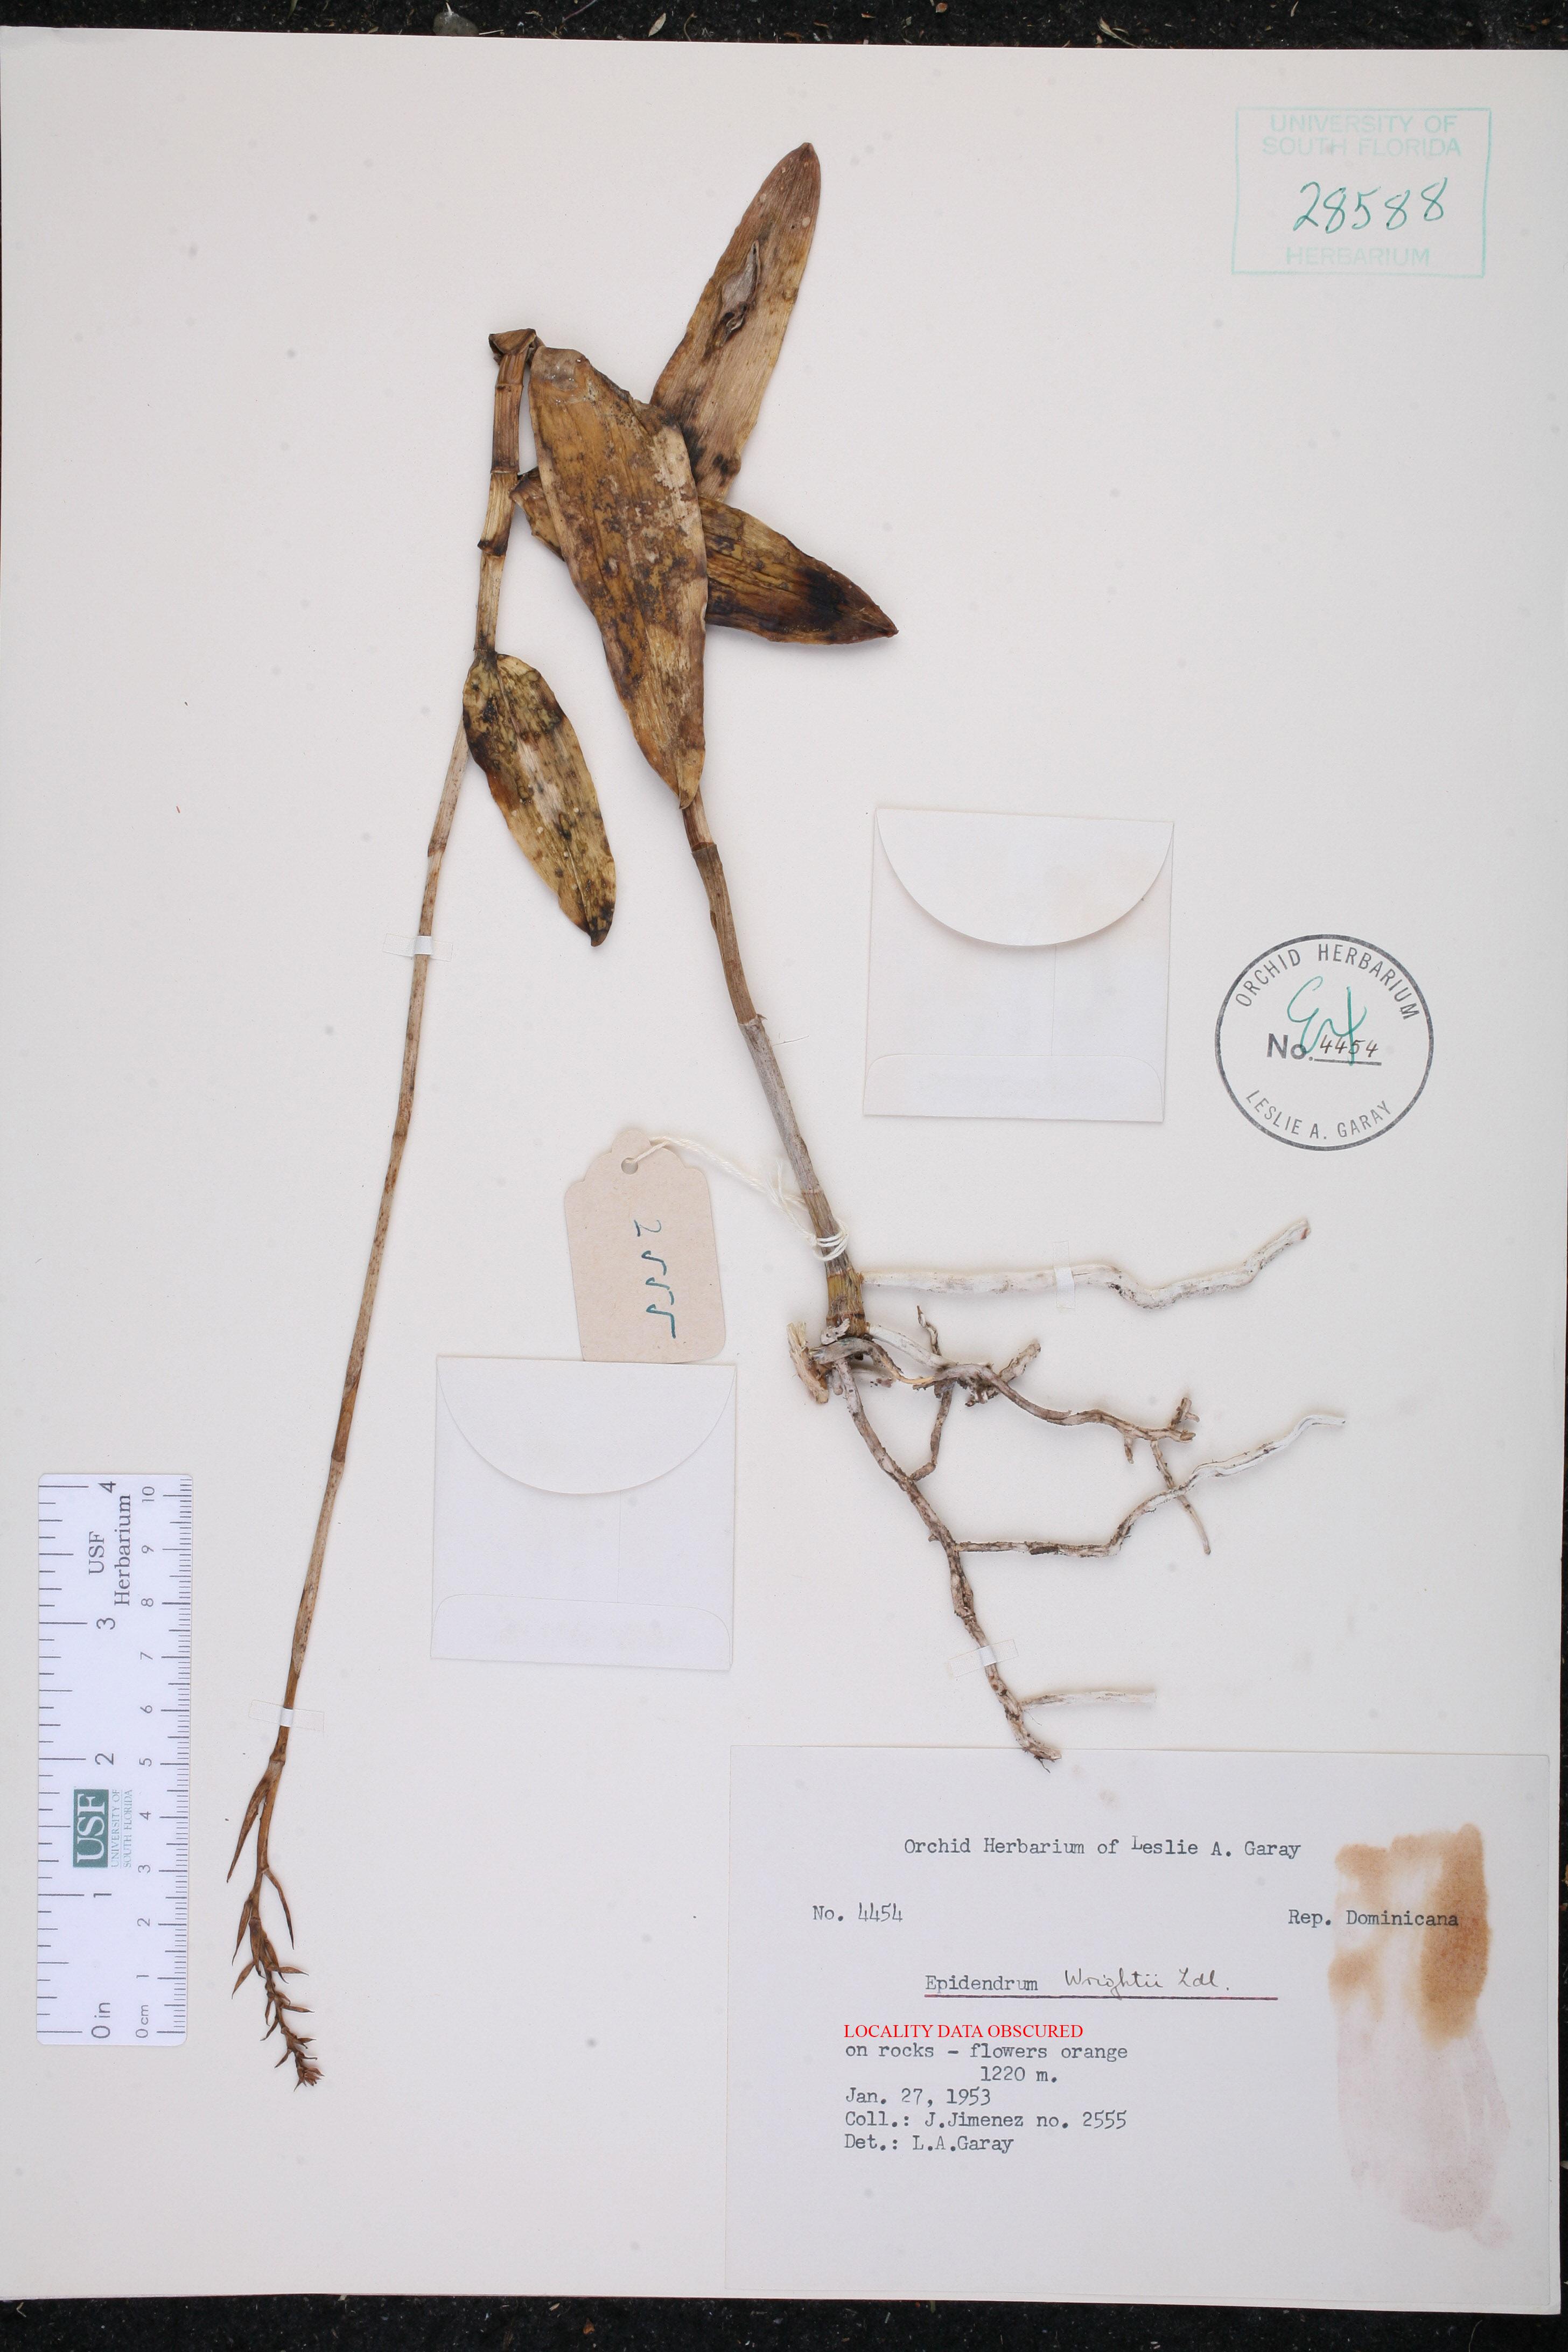 Epidendrum wrightii image